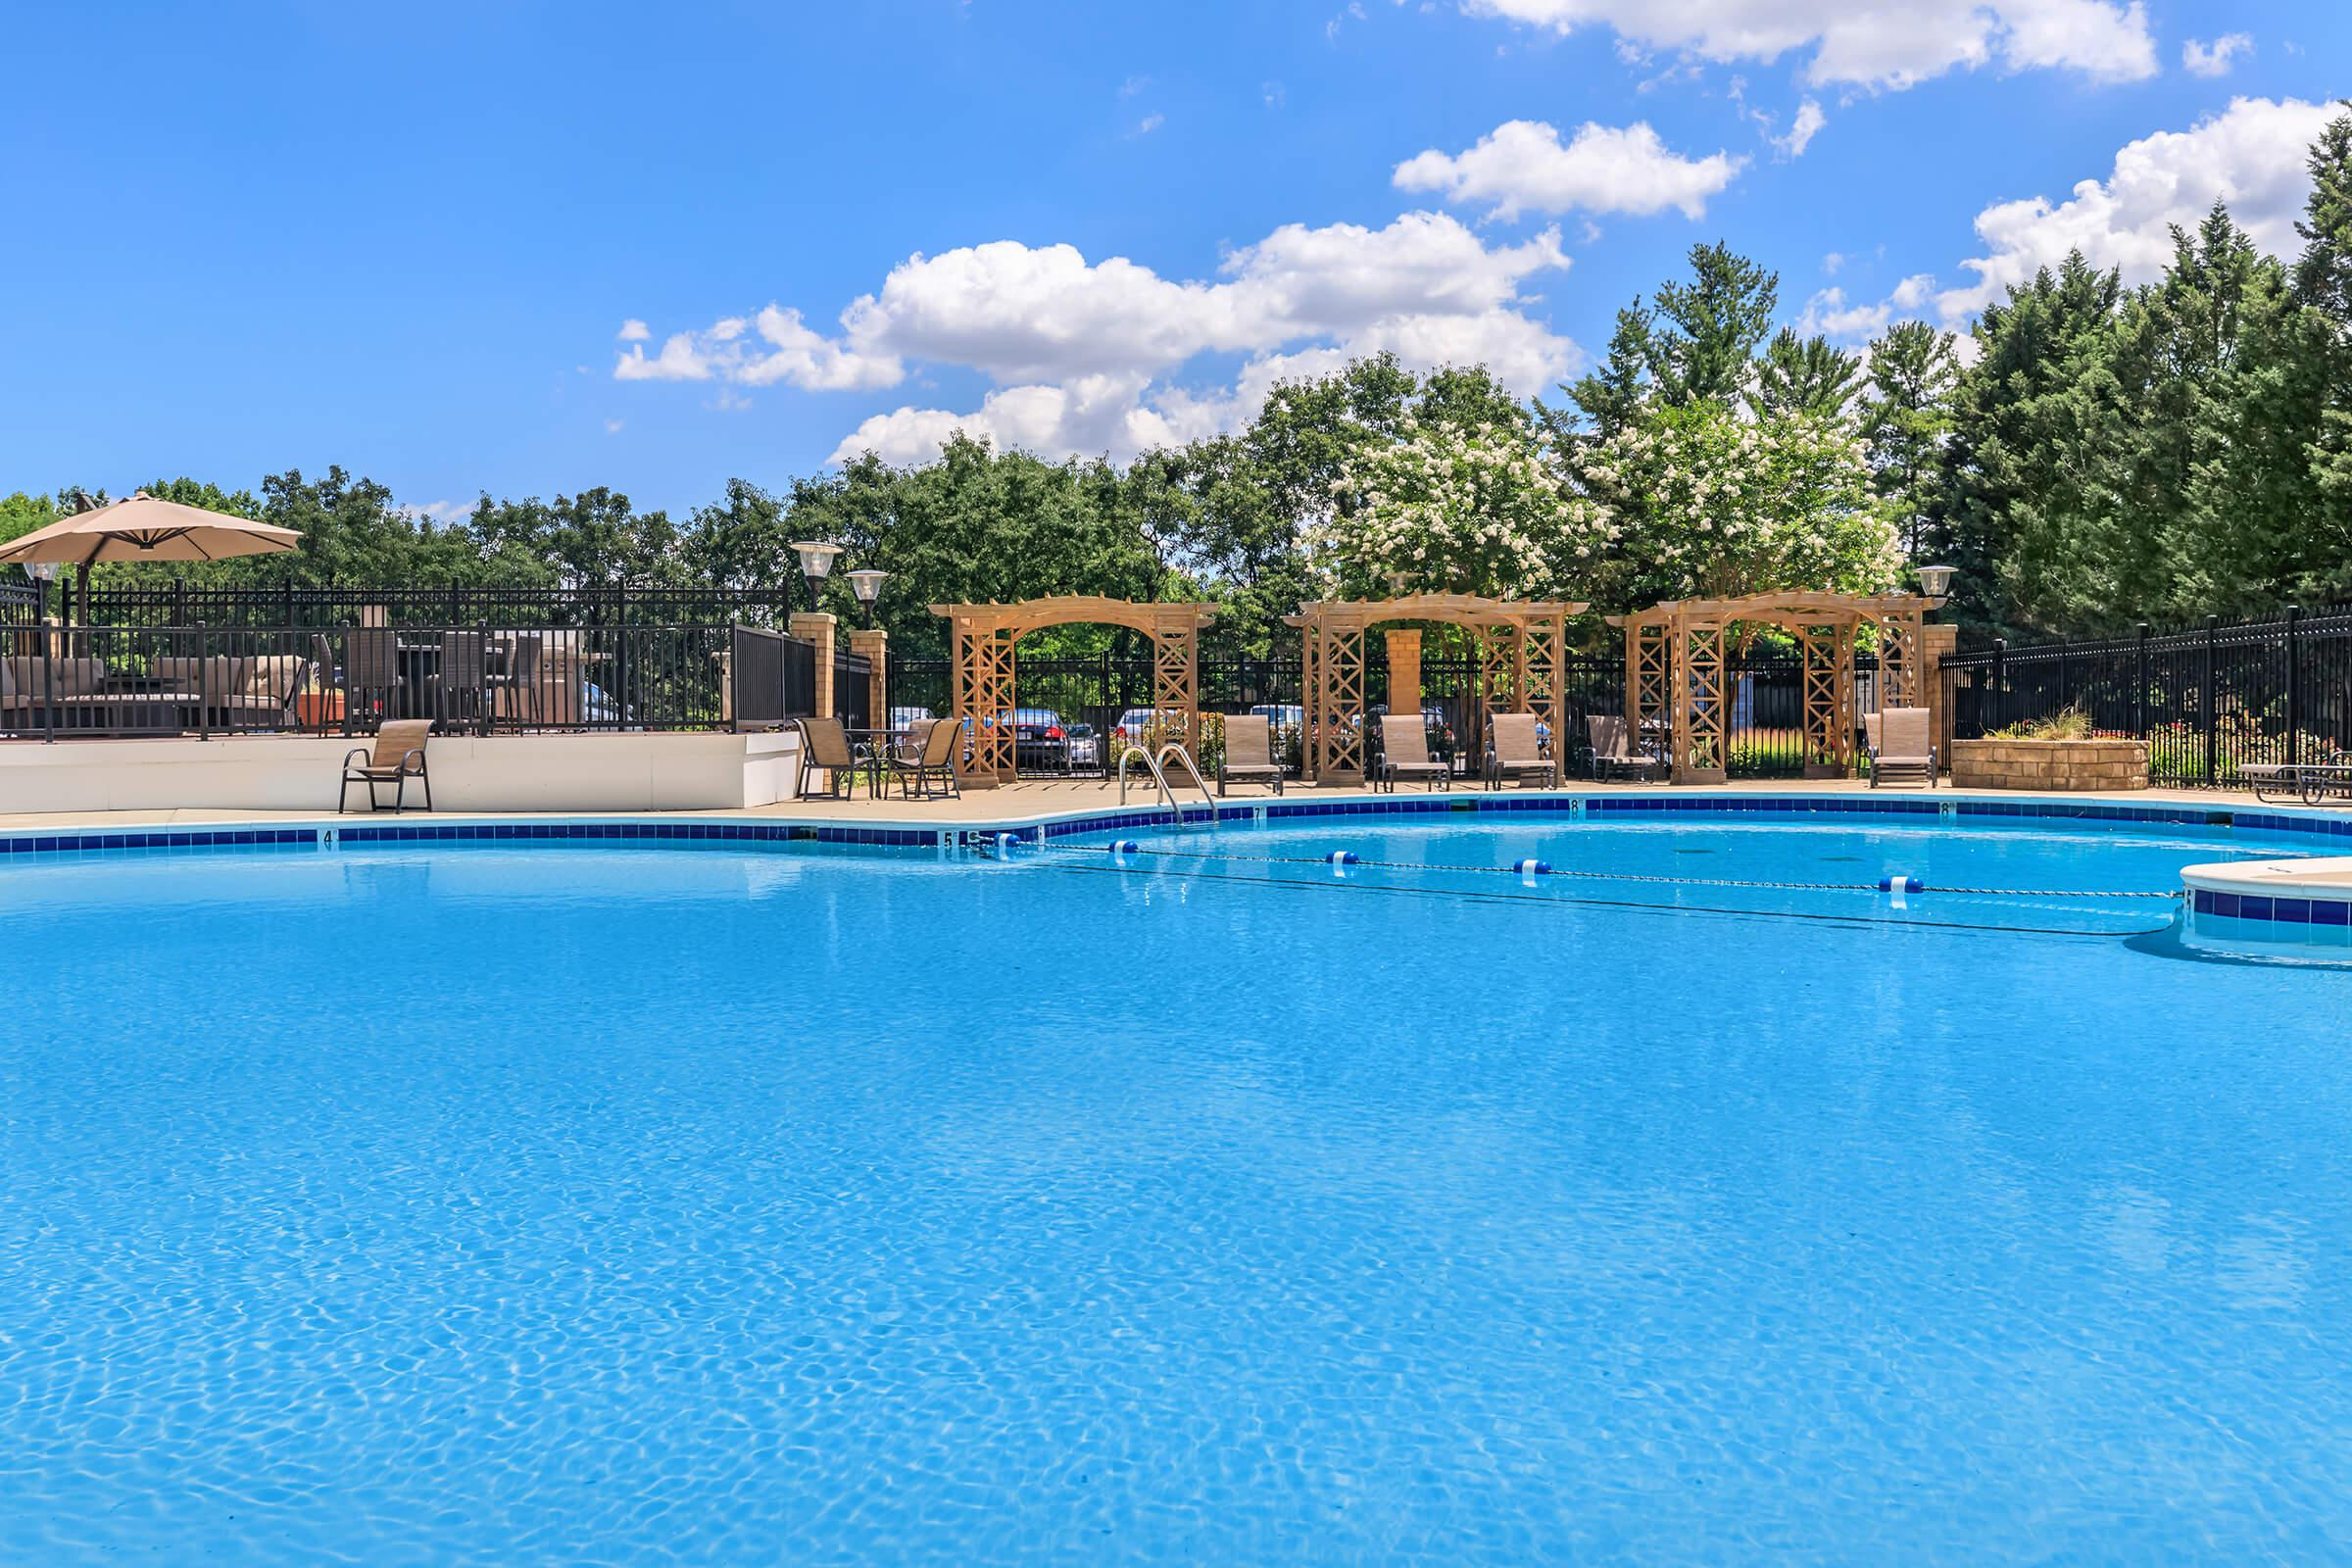 Pool at Whitestoneat Landmark in Alexandria VA